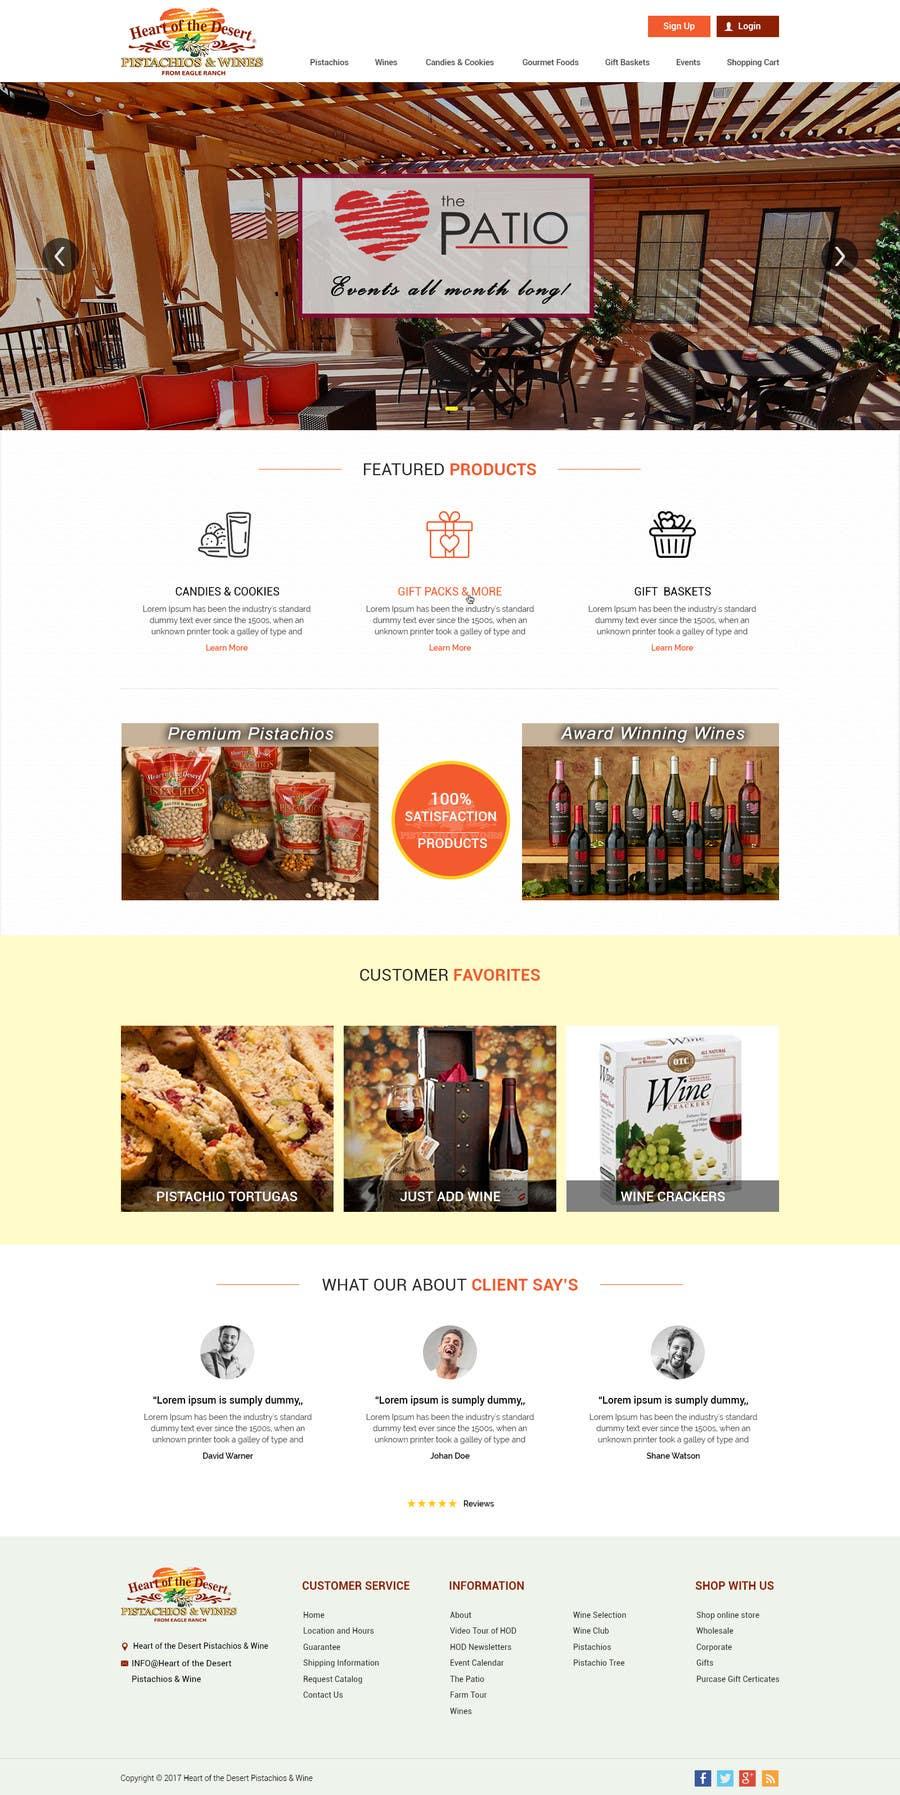 Proposition n°12 du concours Design a Website Mockup for E-commerce Site